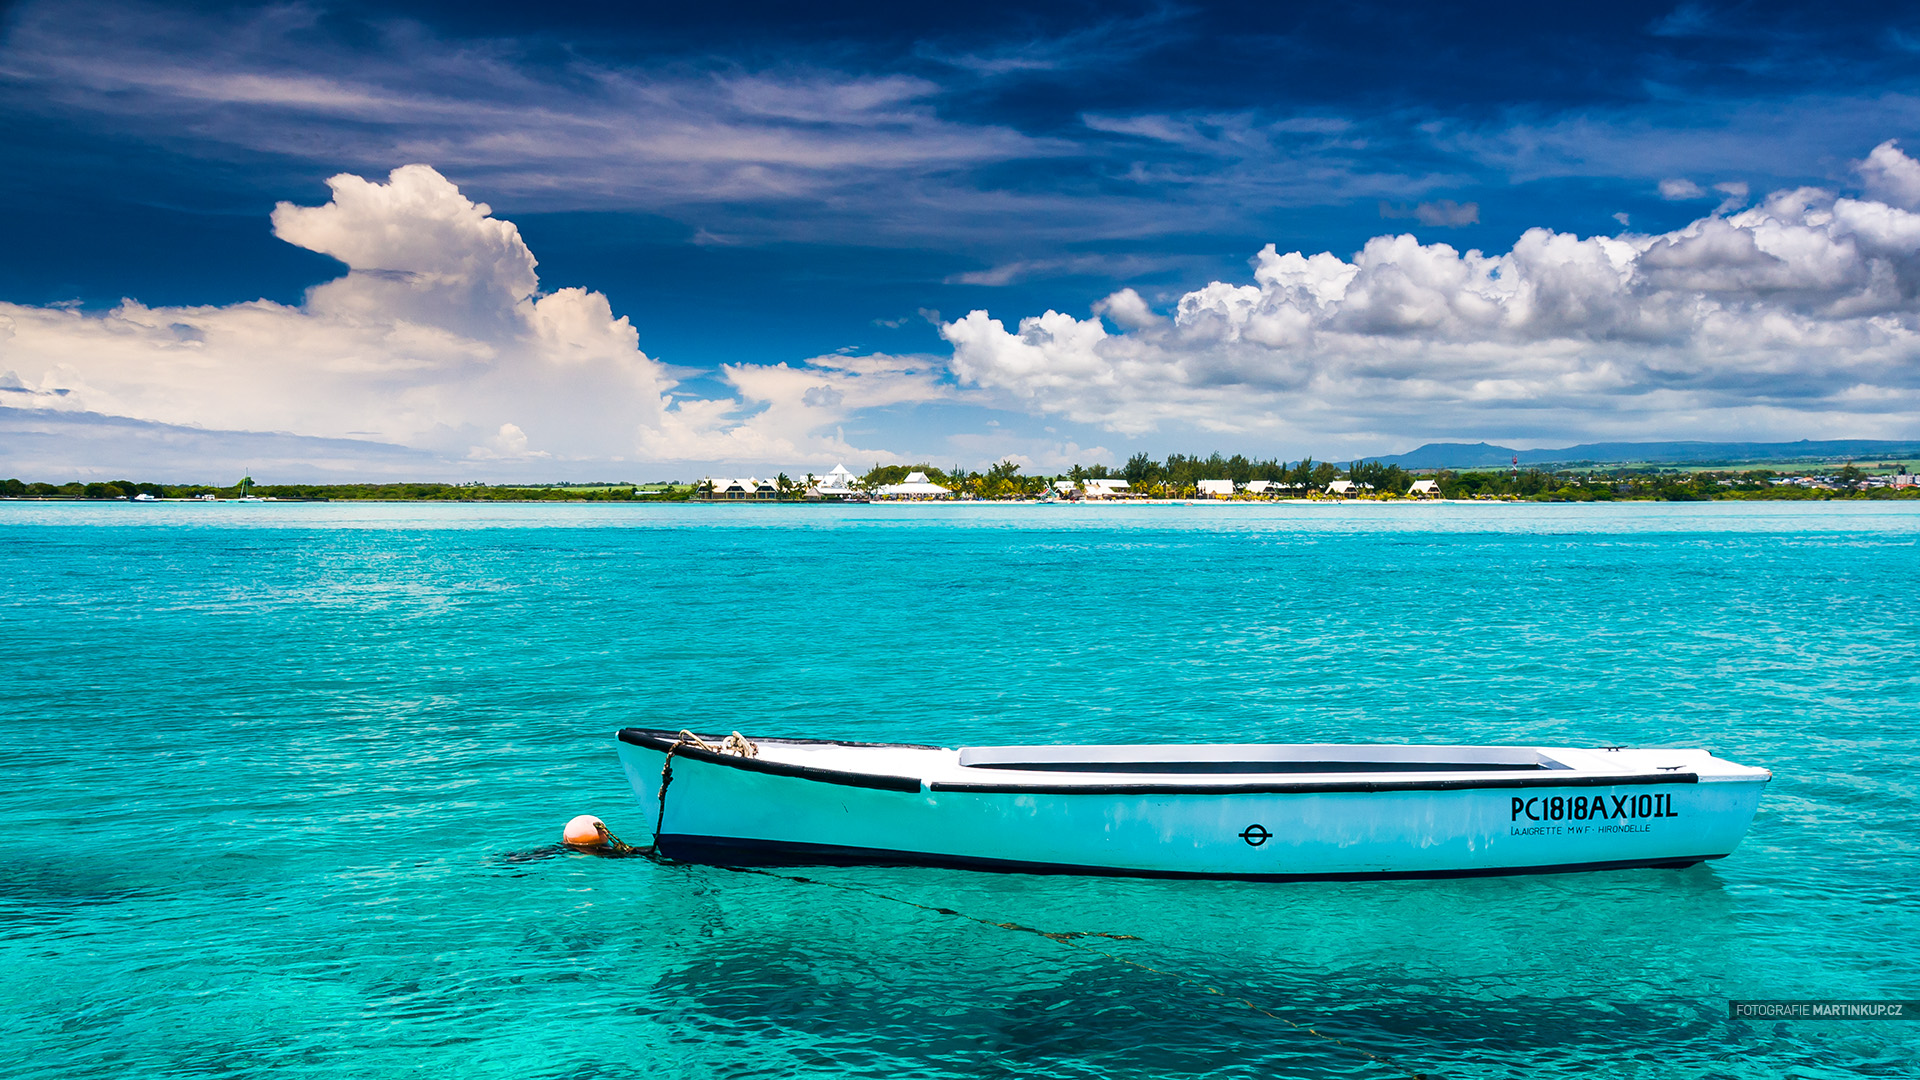 Tapeta na plochu: Blue Bay, Mauritius (16:9)